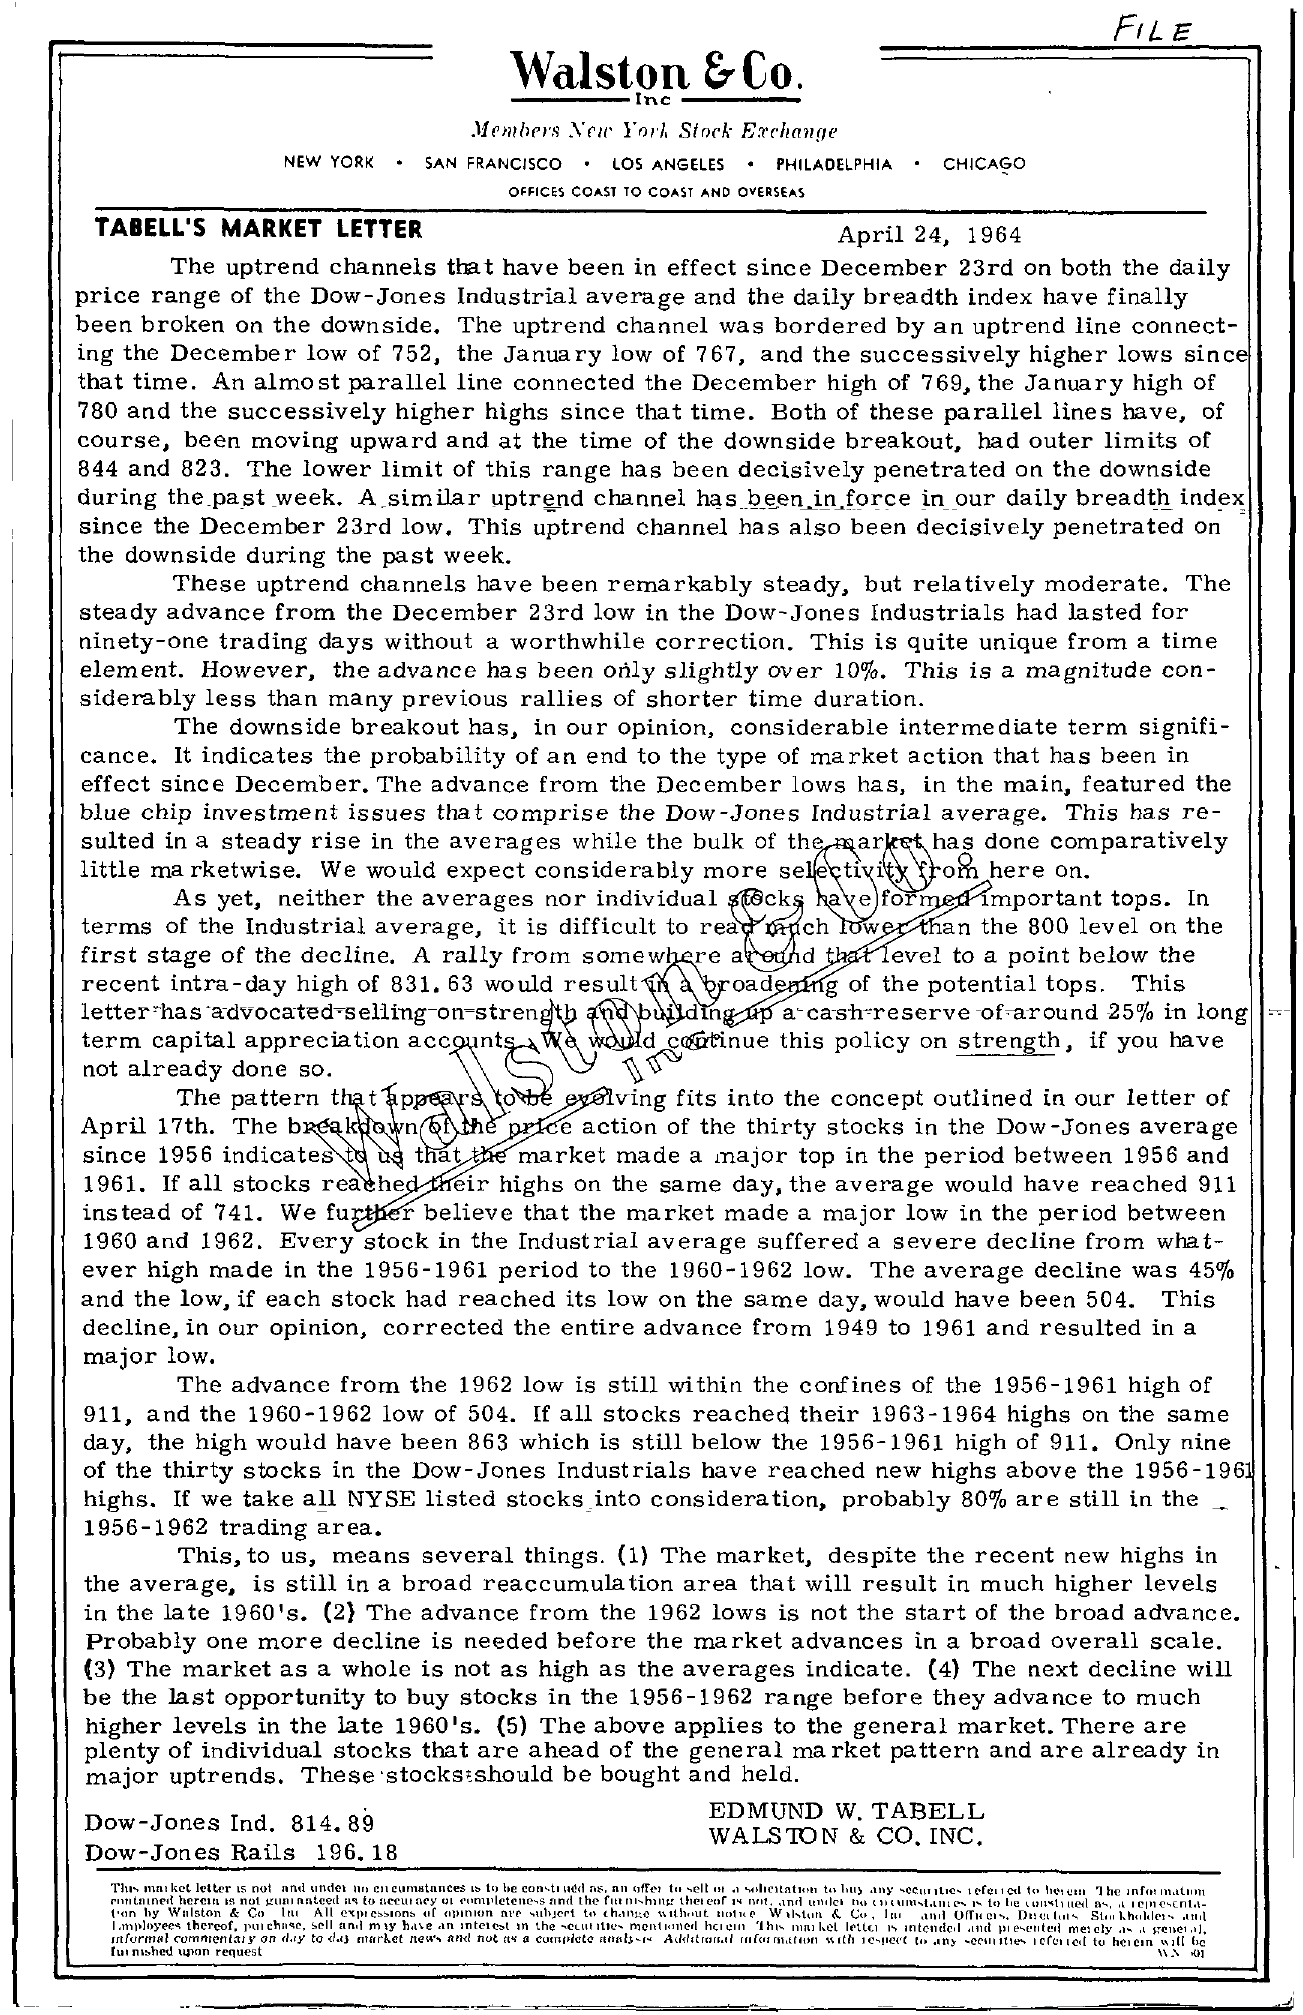 Tabell's Market Letter - April 24, 1964